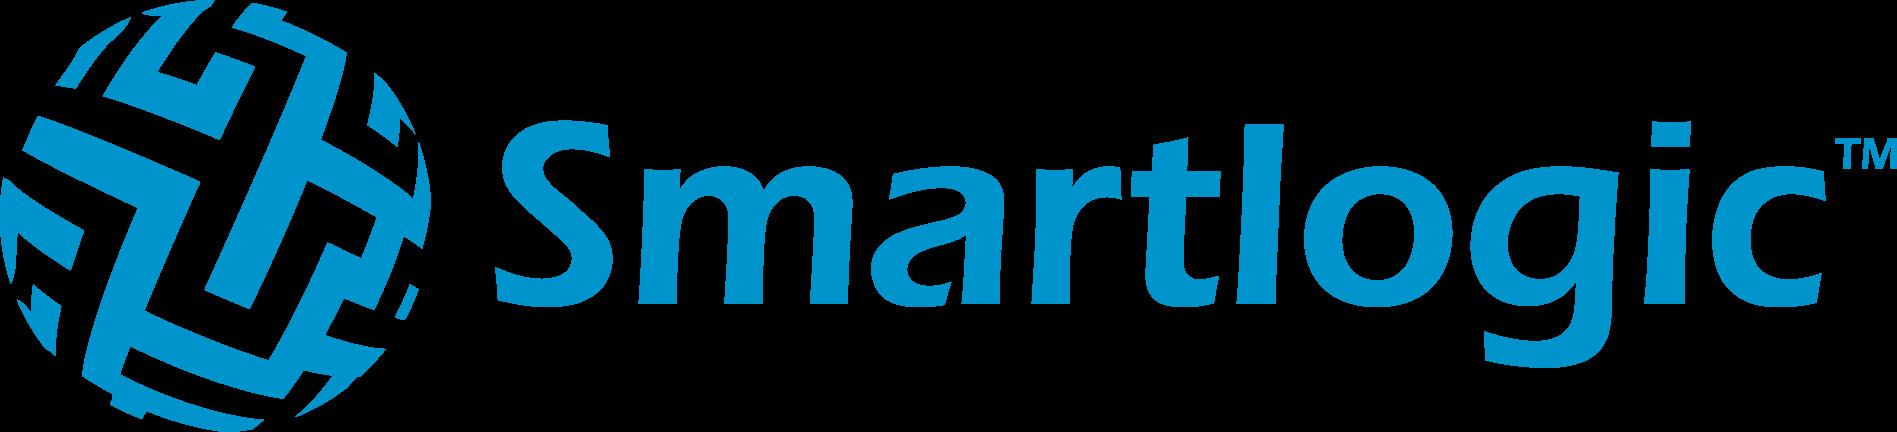 Smartlogic Semaphore logo